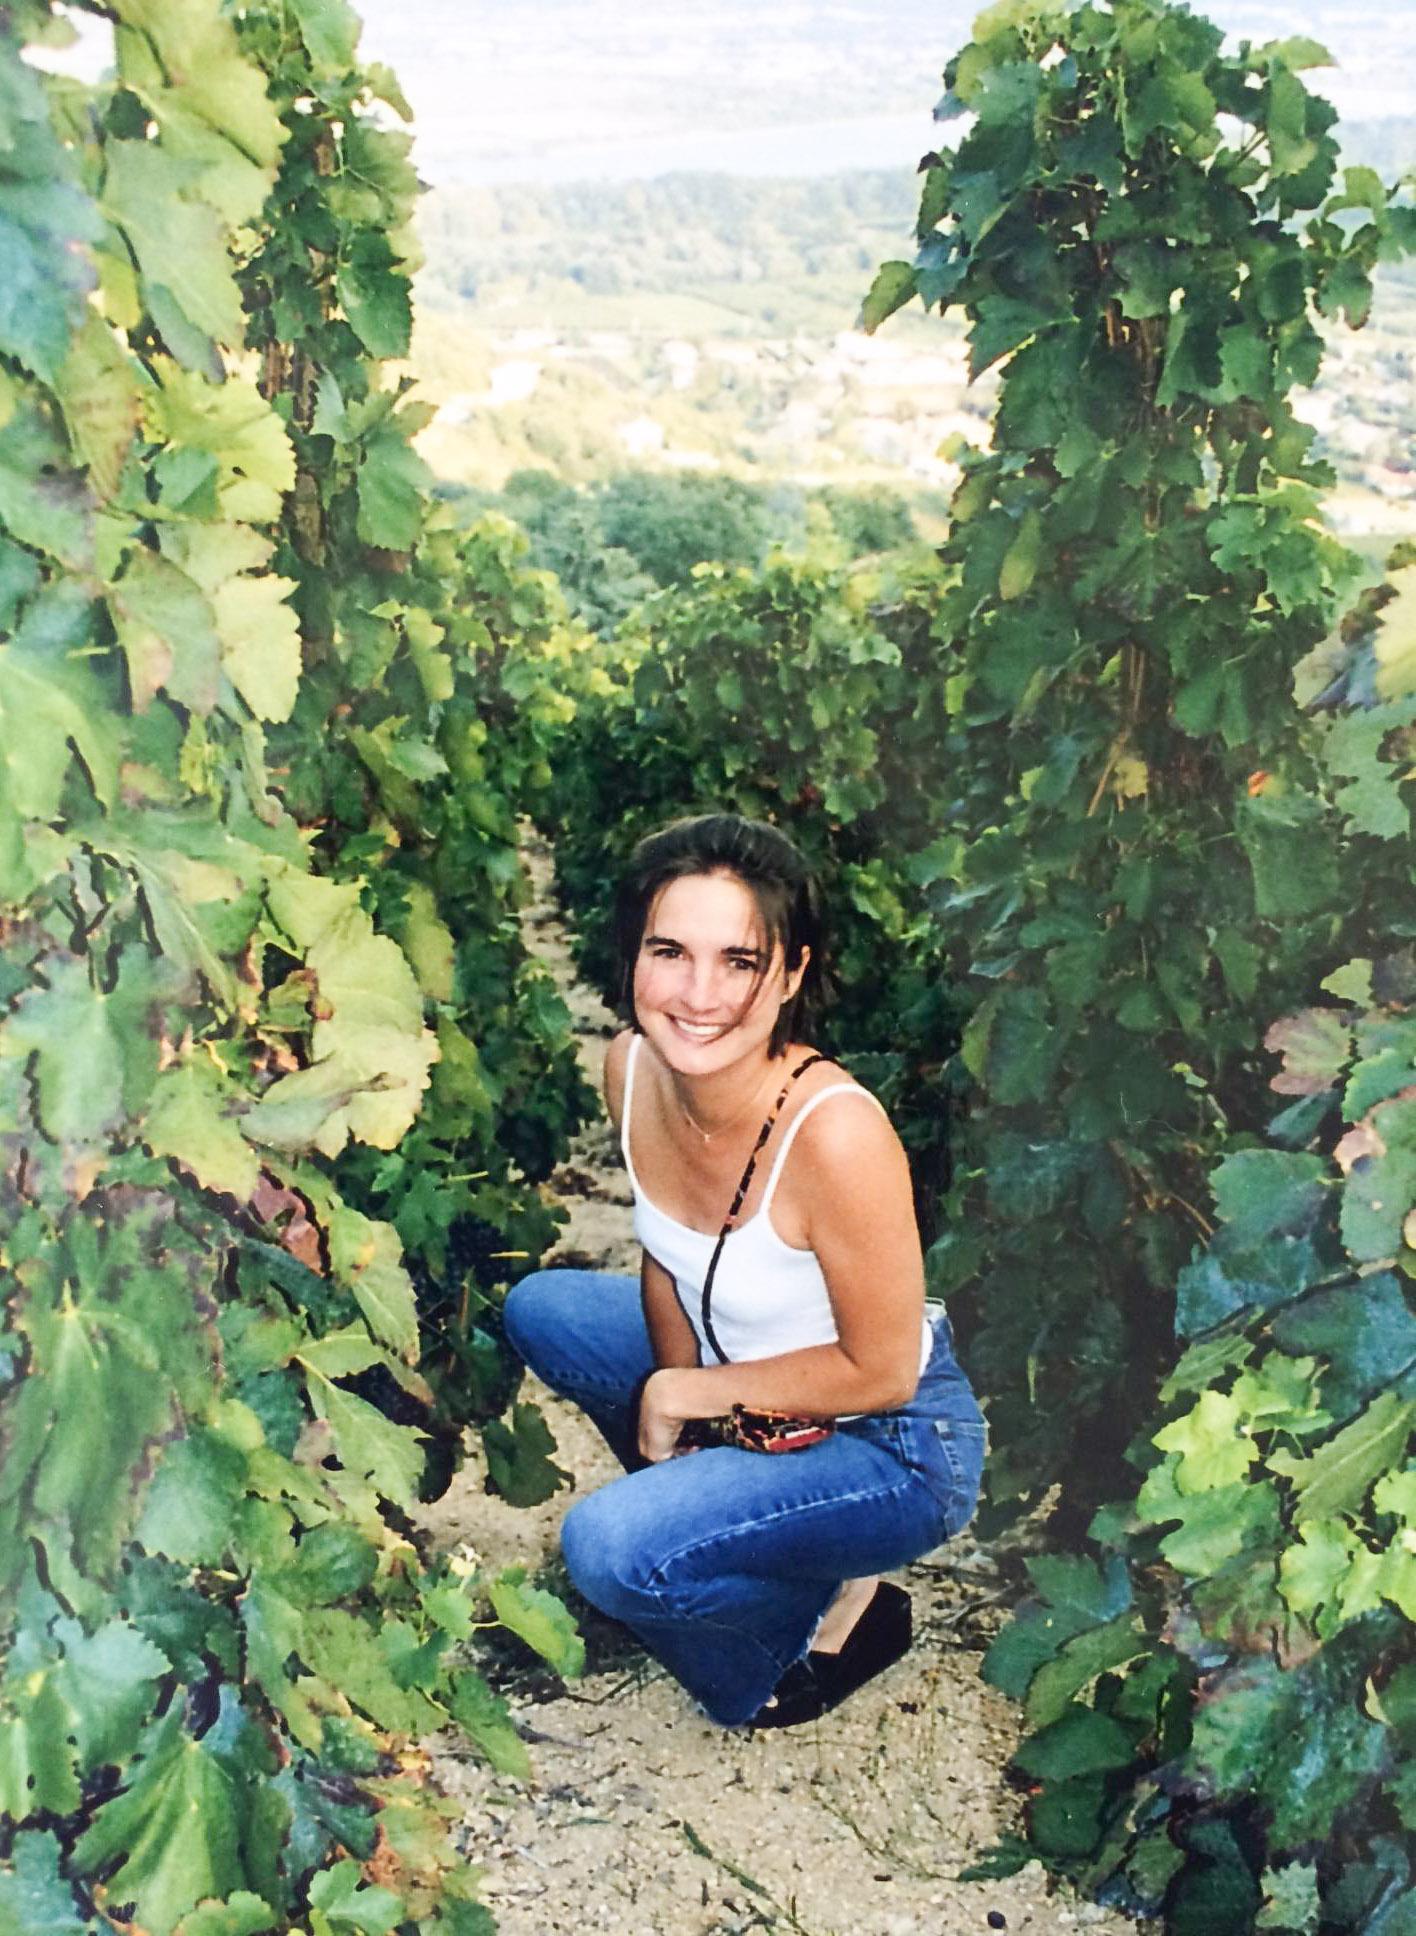 Inez at a vineyard in Condrieu, France